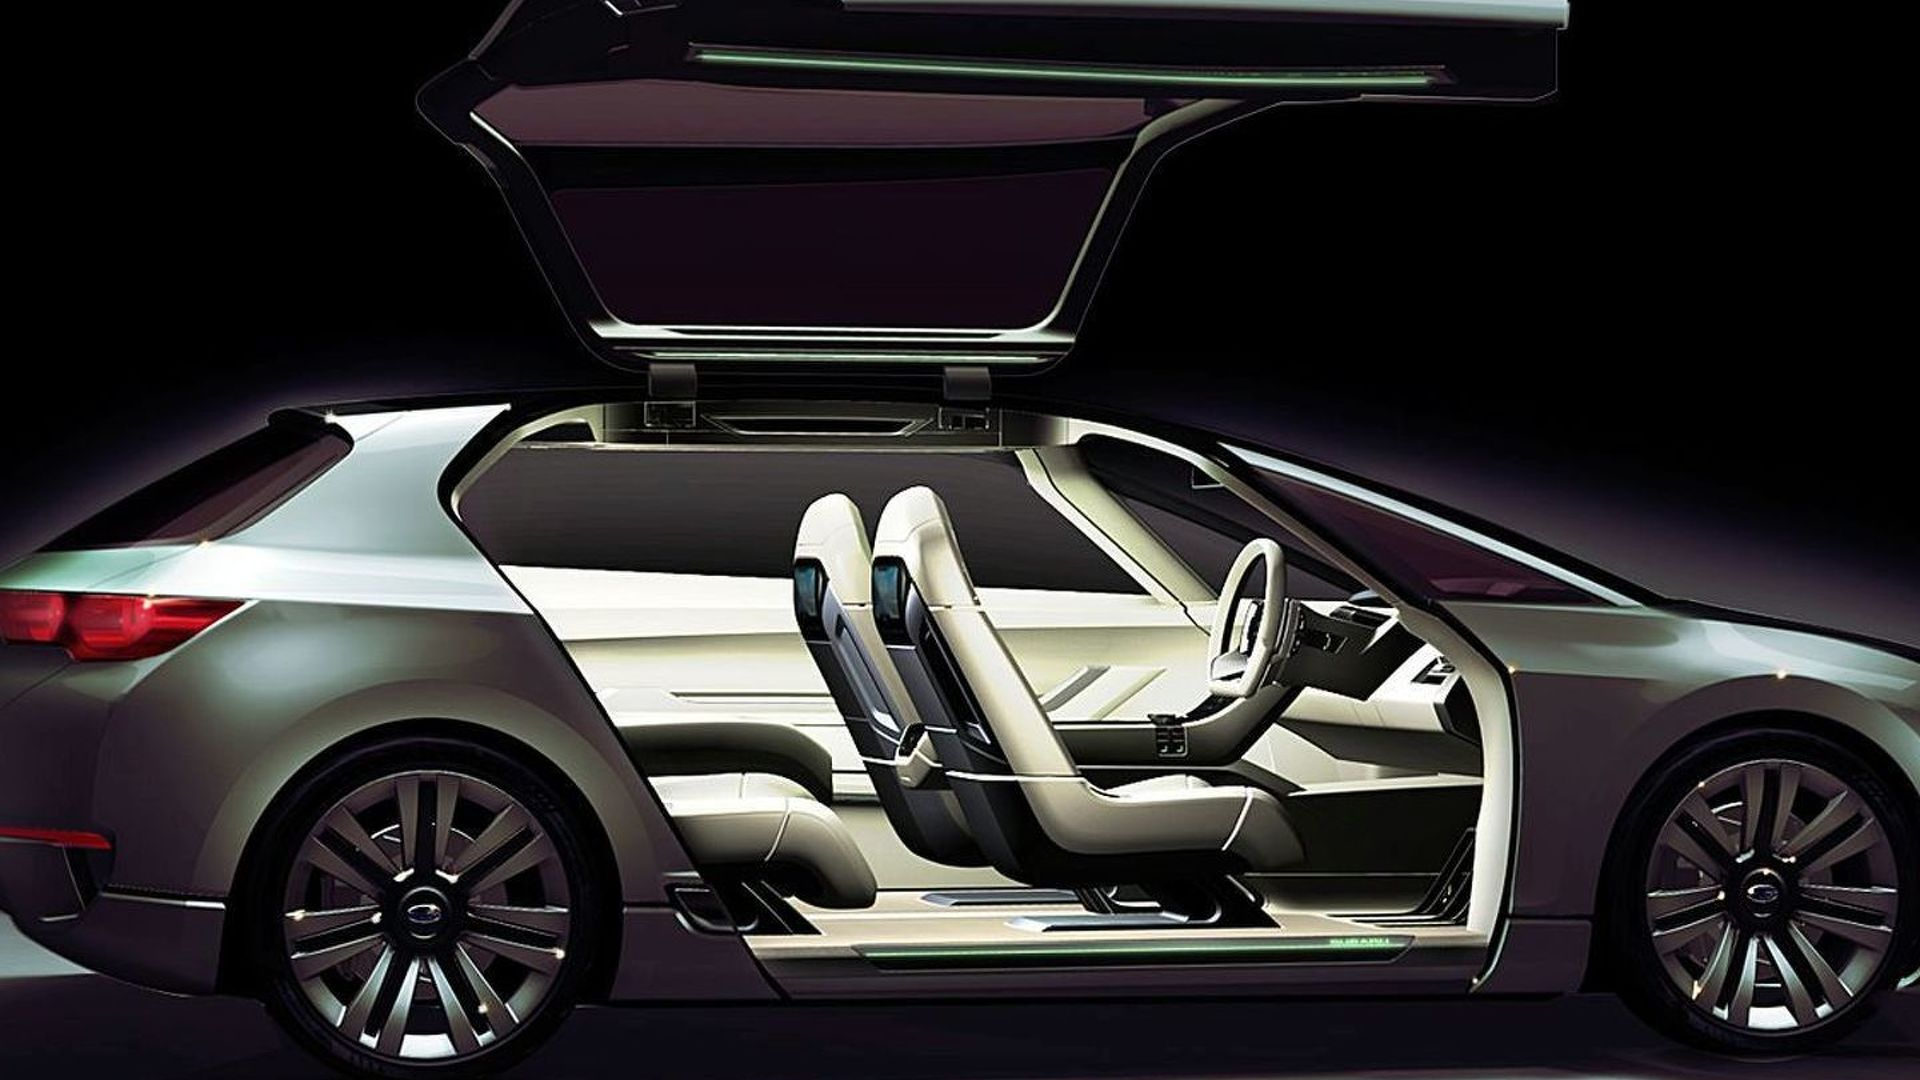 Subaru Hybrid Tourer Concept Revealed Ahead of Tokyo Debut